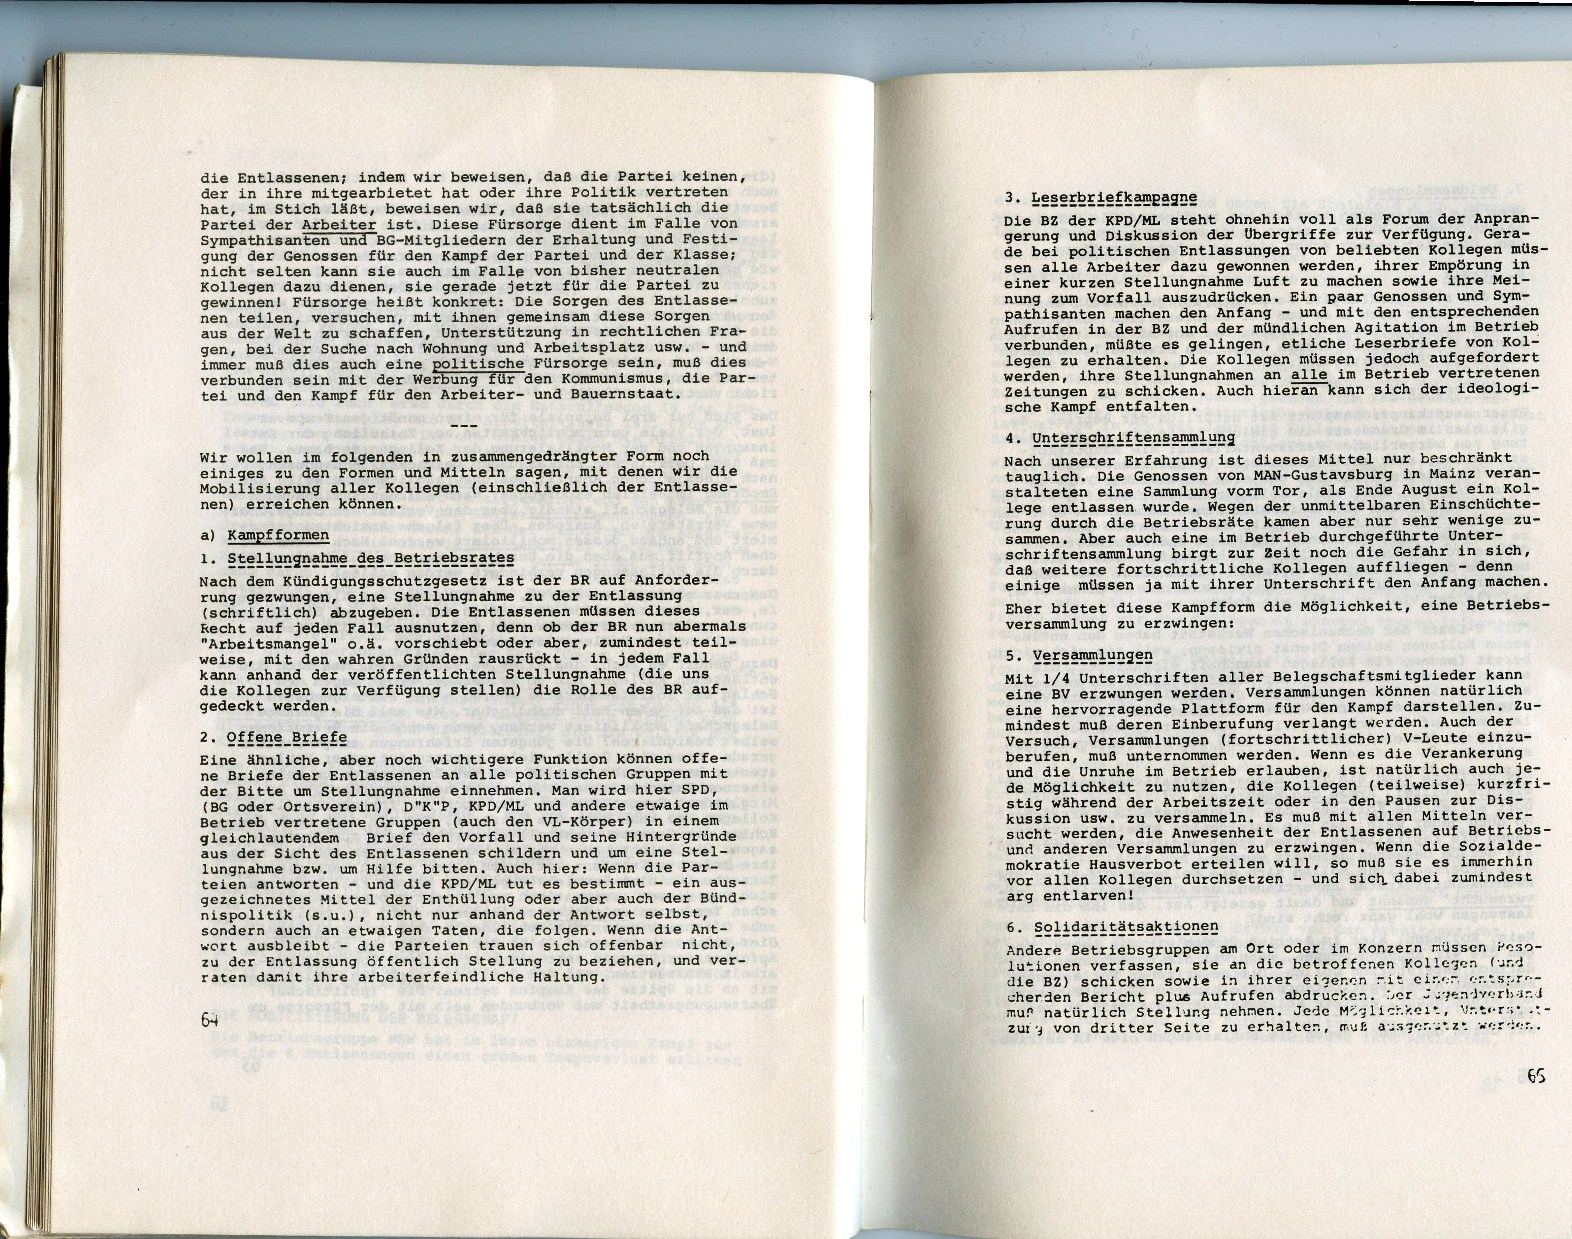 ZB_Parteiarbeiter_1971_09_33